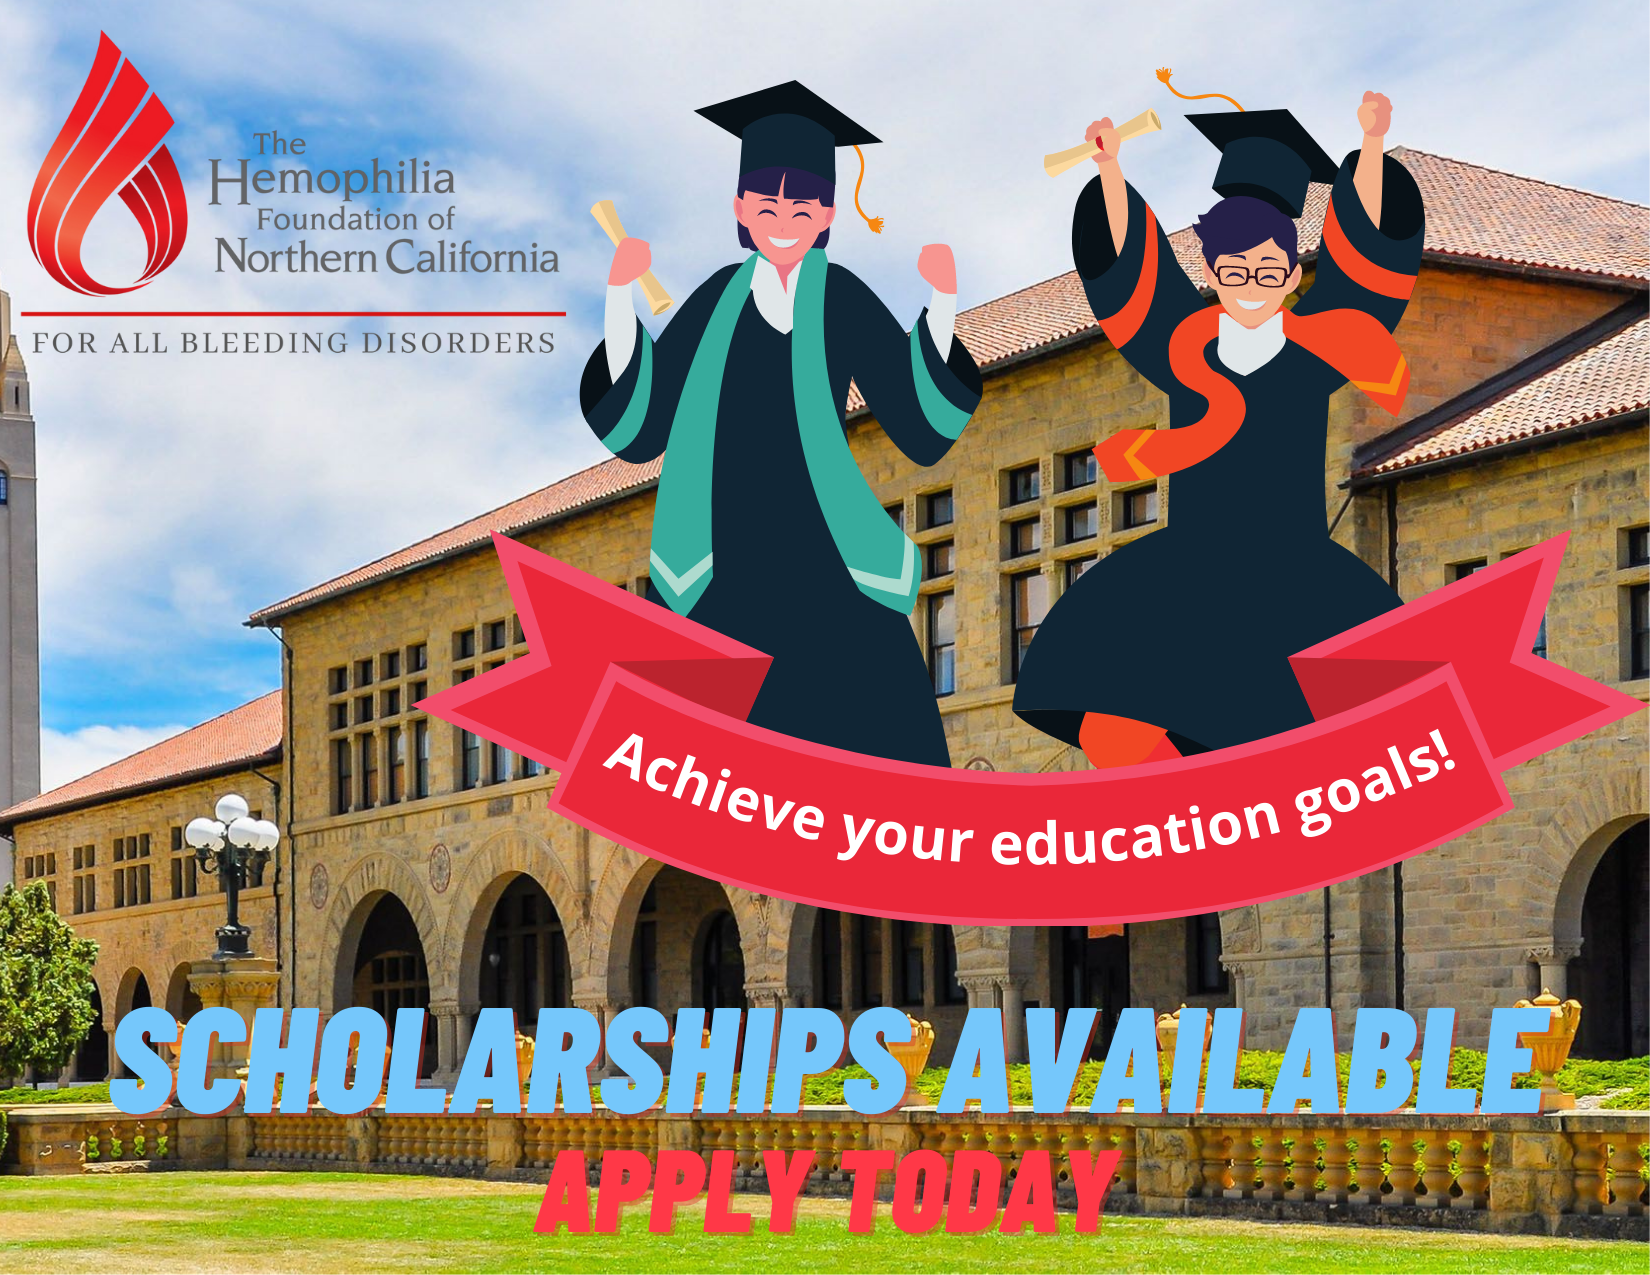 HFNC Scholarships are Open!